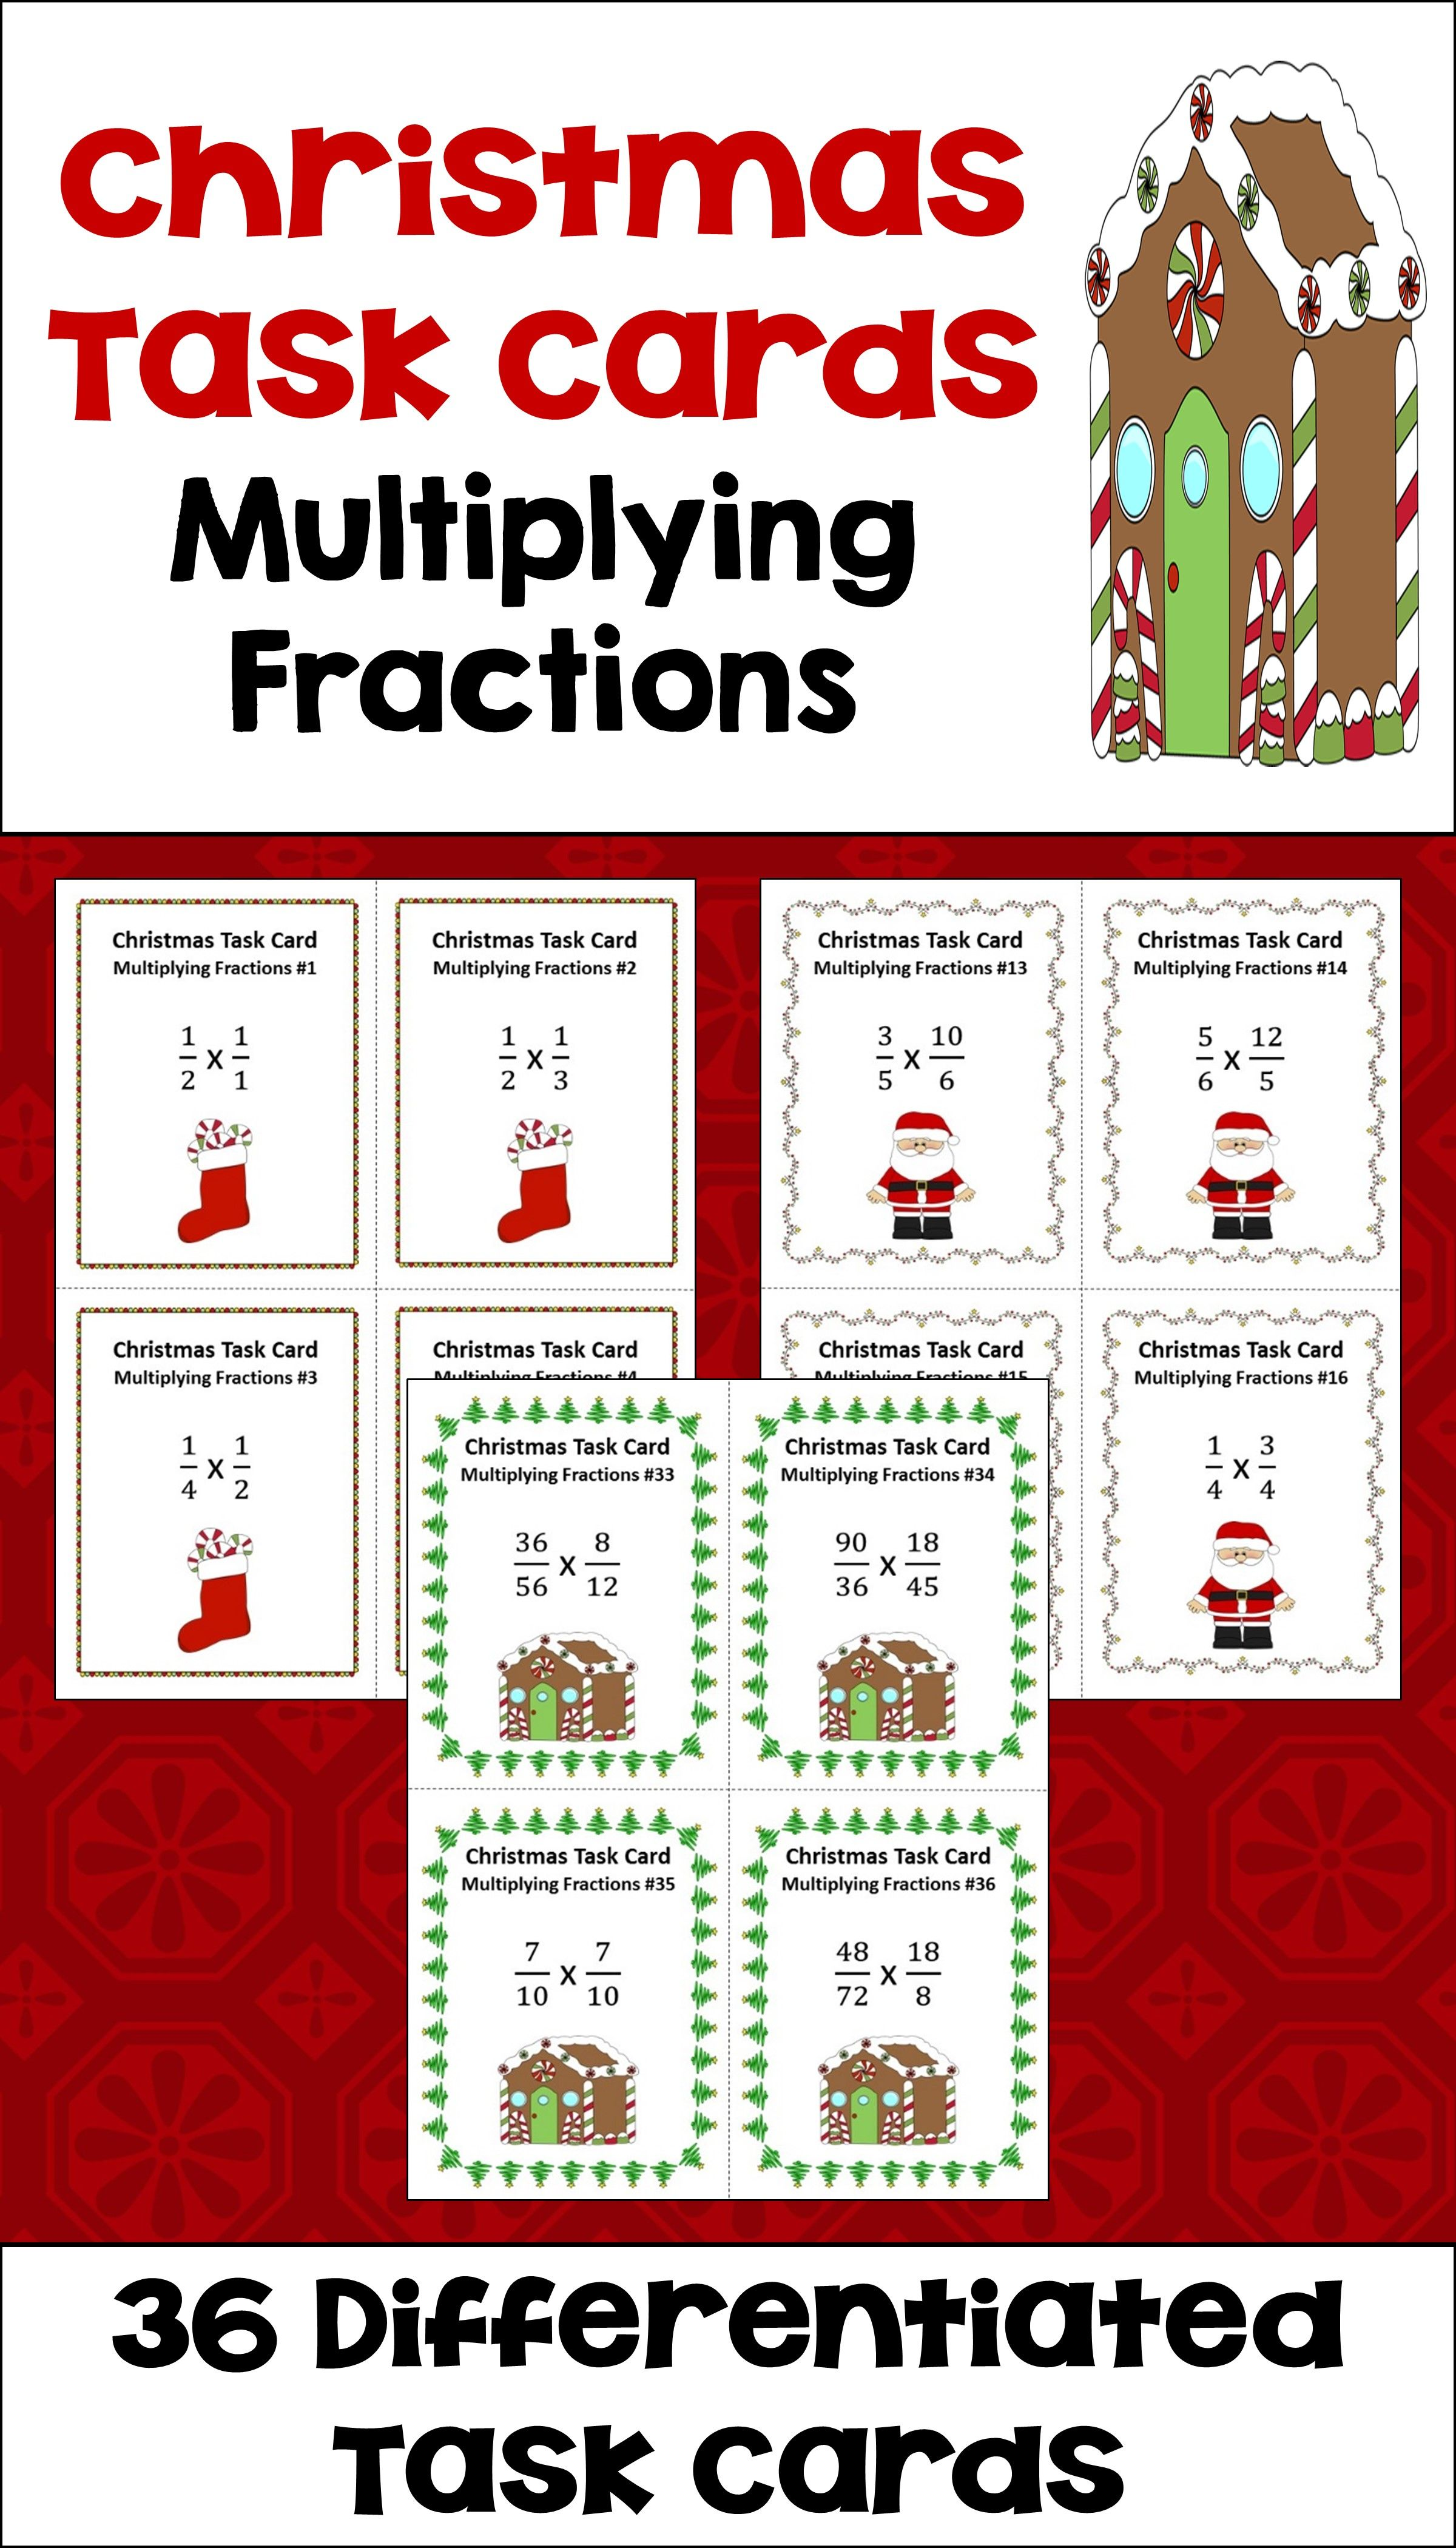 Christmas Multiplying Fractions Task Cards